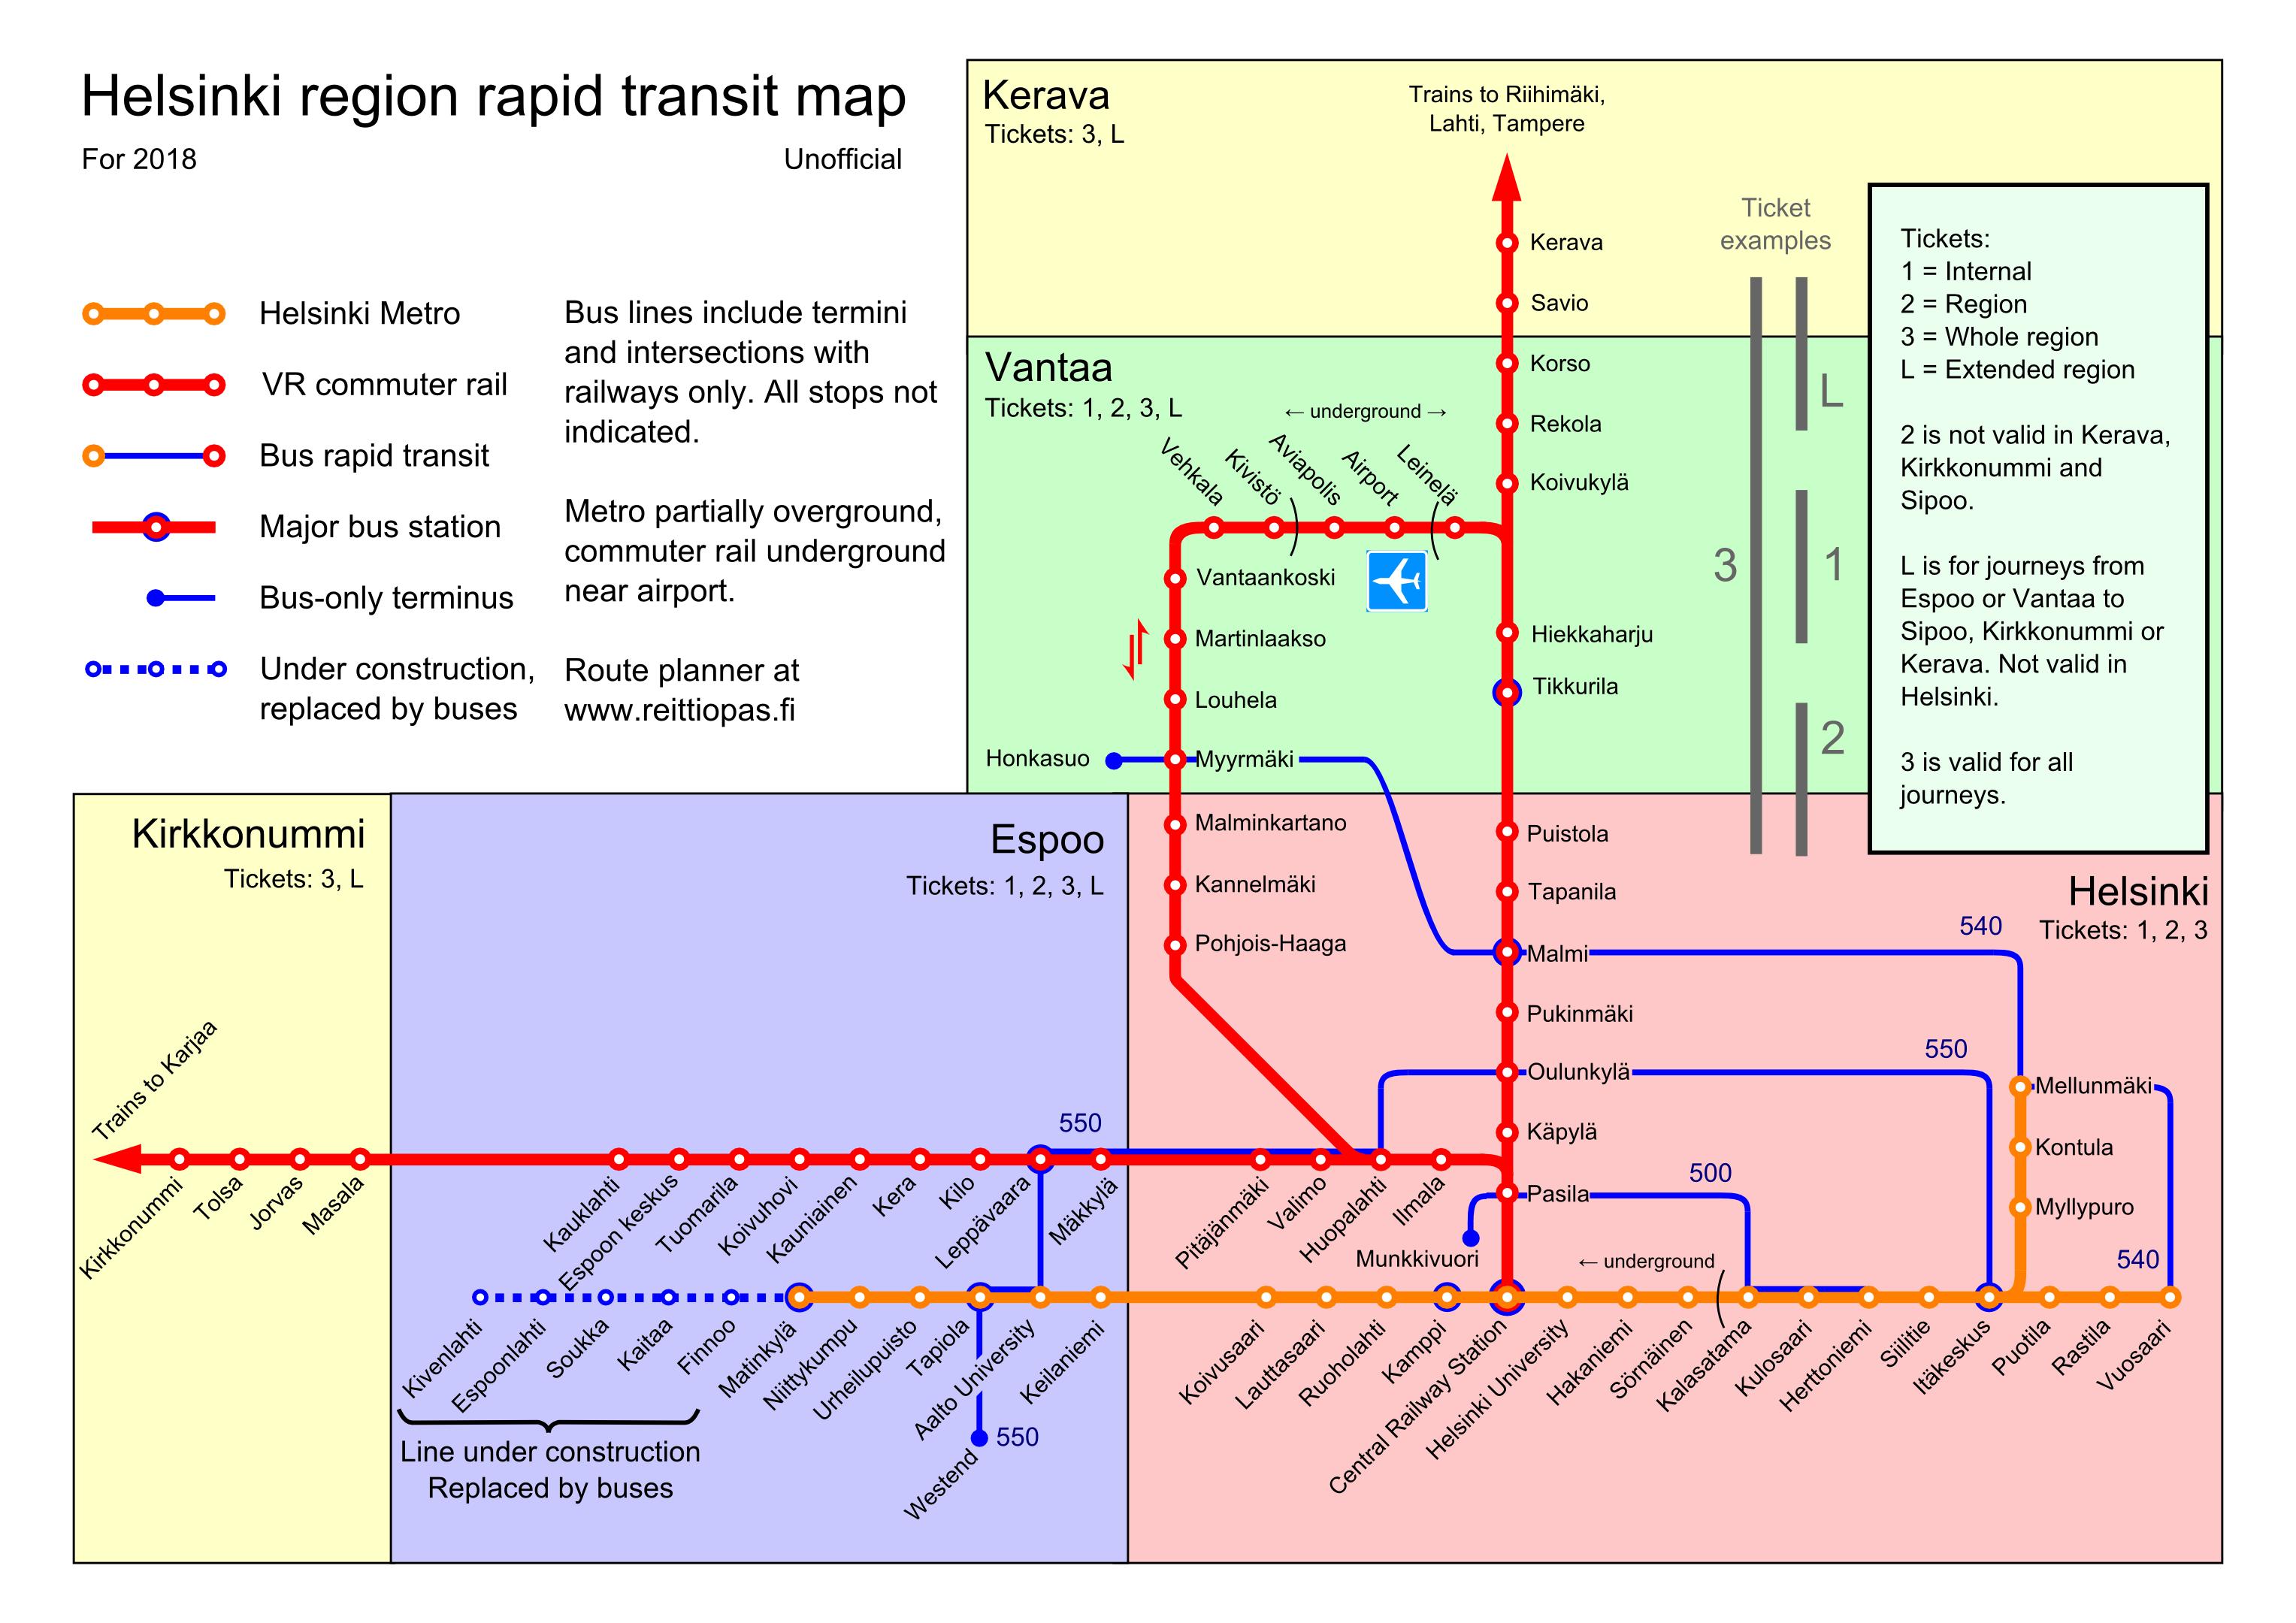 Pocketready rapid transit map for Helsinki region including metro